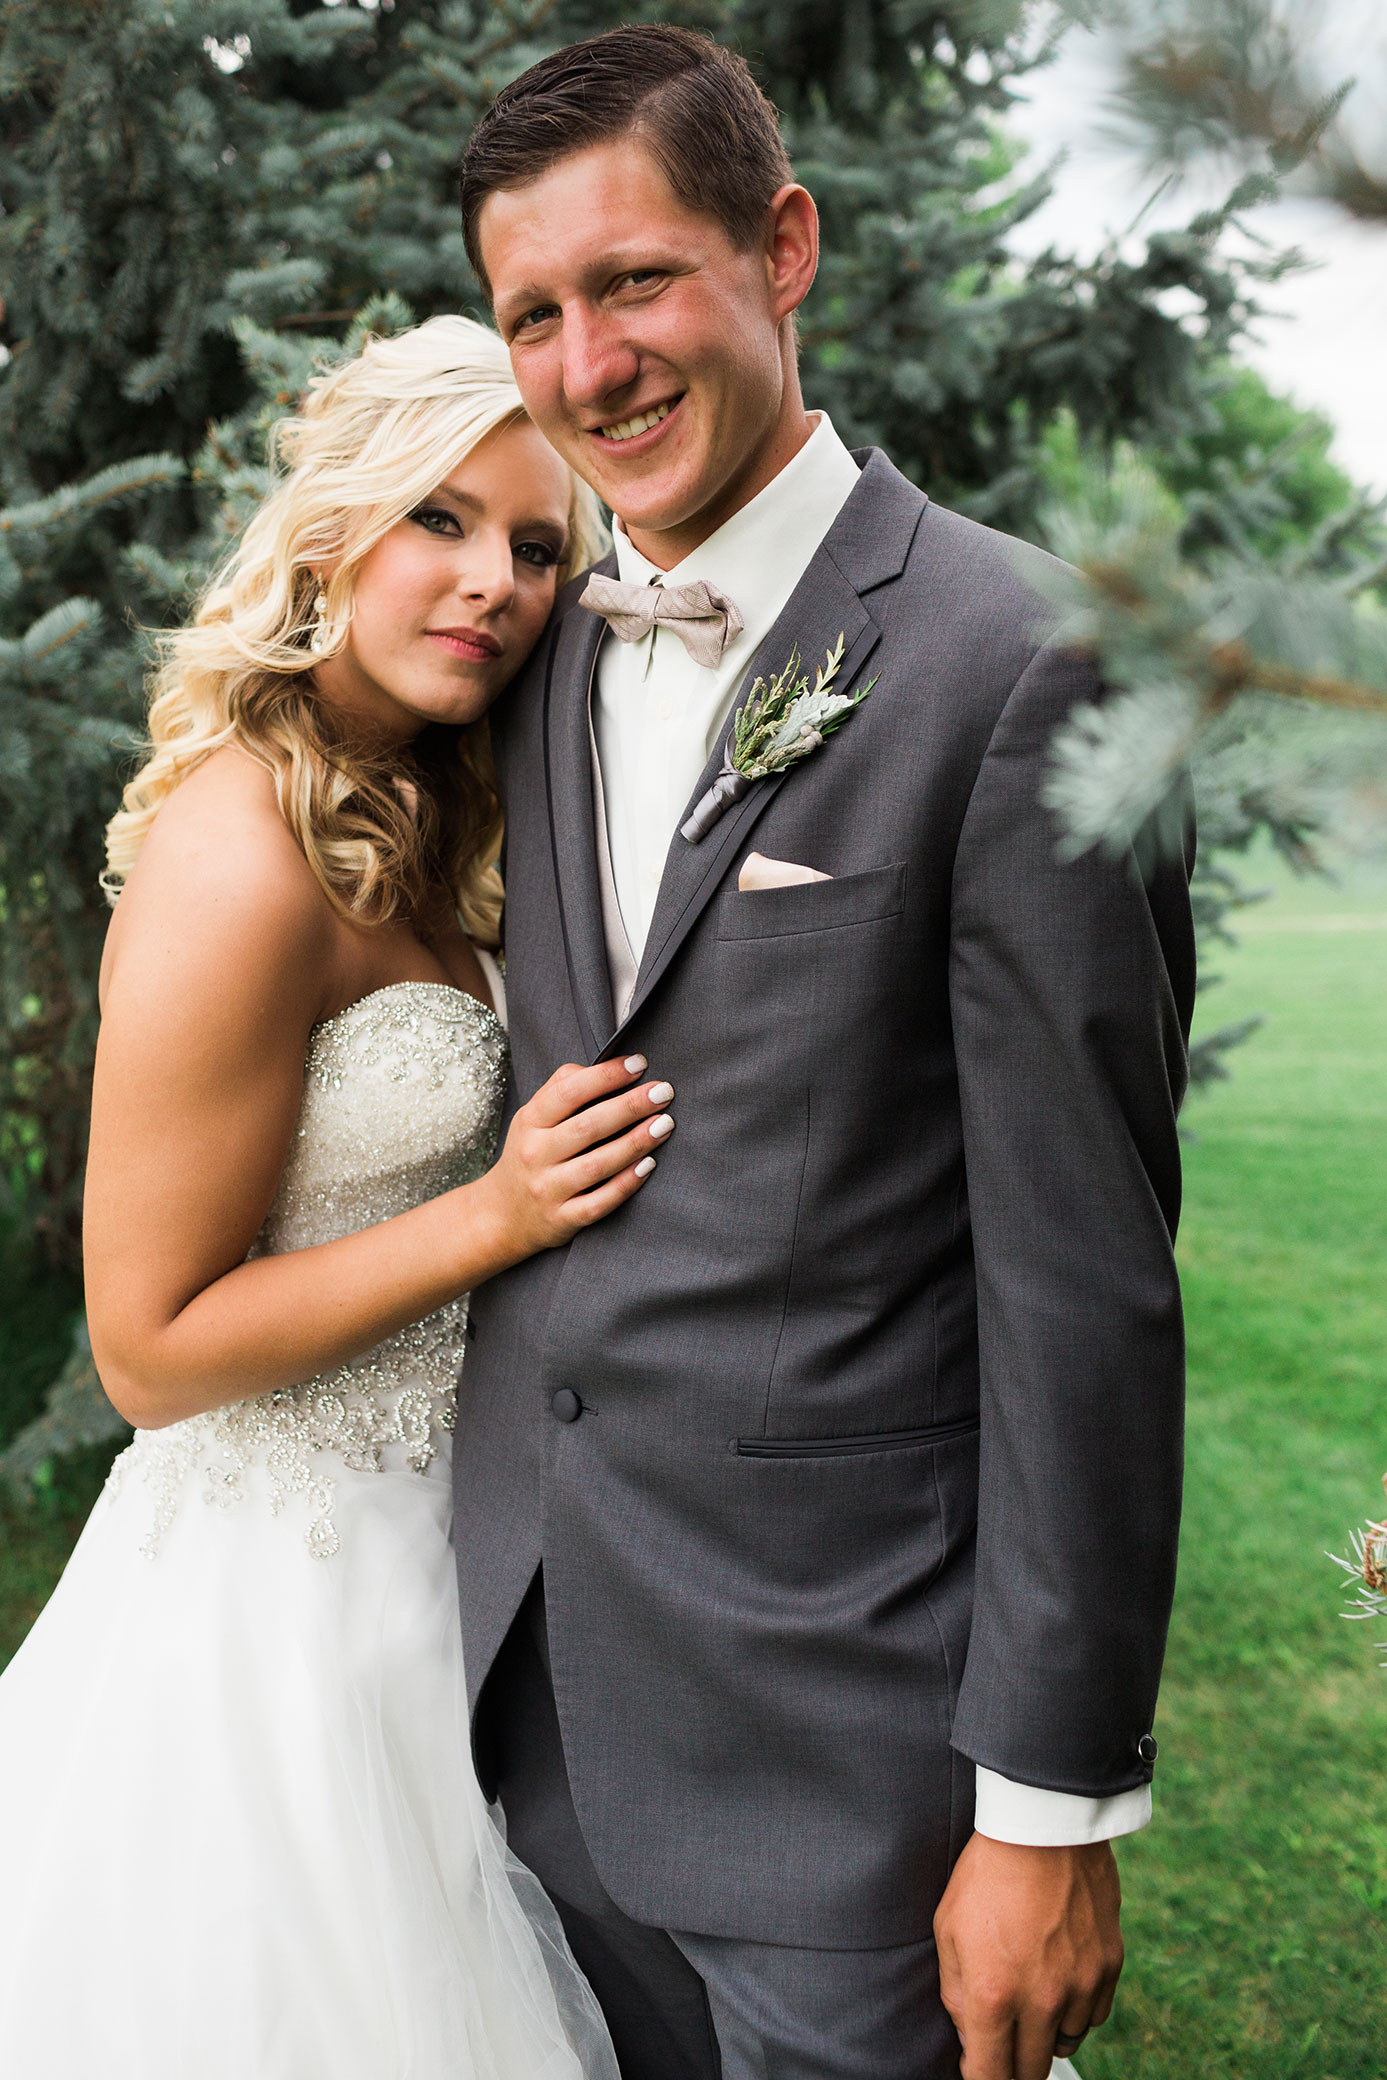 Indian_Creek_Country_Club_Omaha_Wedding_Danielle_Paul-376.jpg